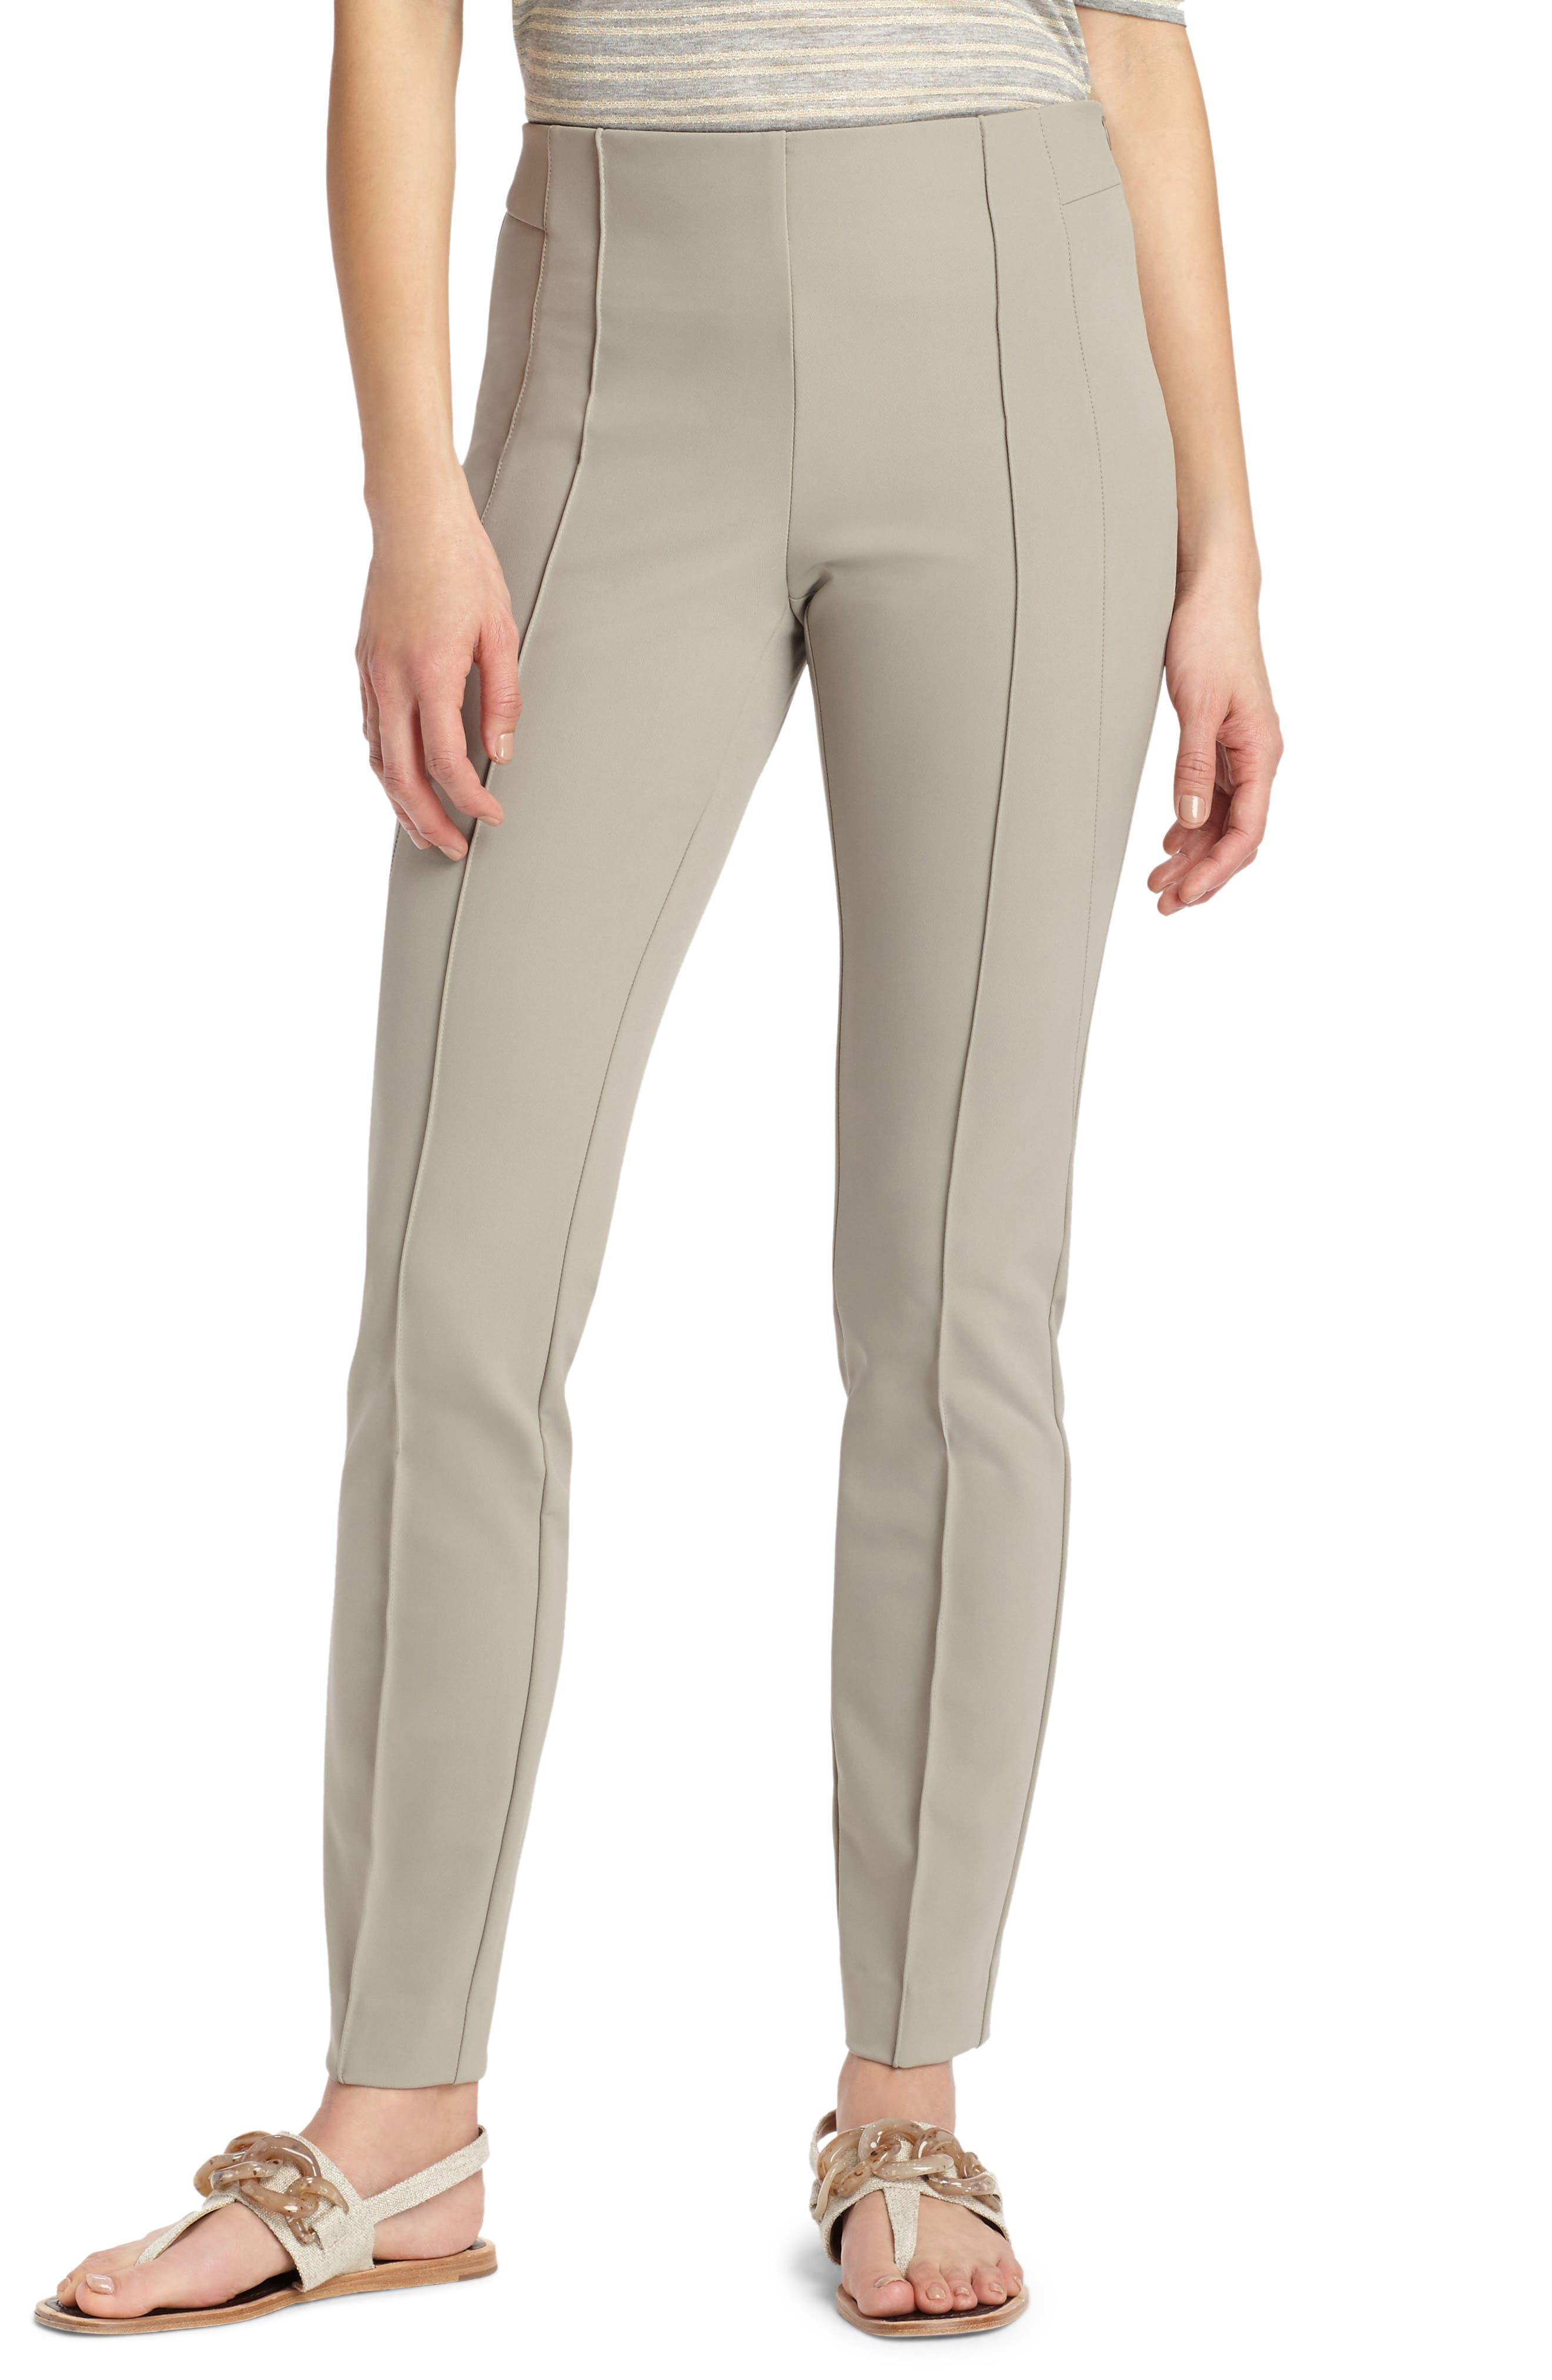 Lafayette 148 New York 'Gramercy' Acclaimed Stretch Pants (Regular & Petite)